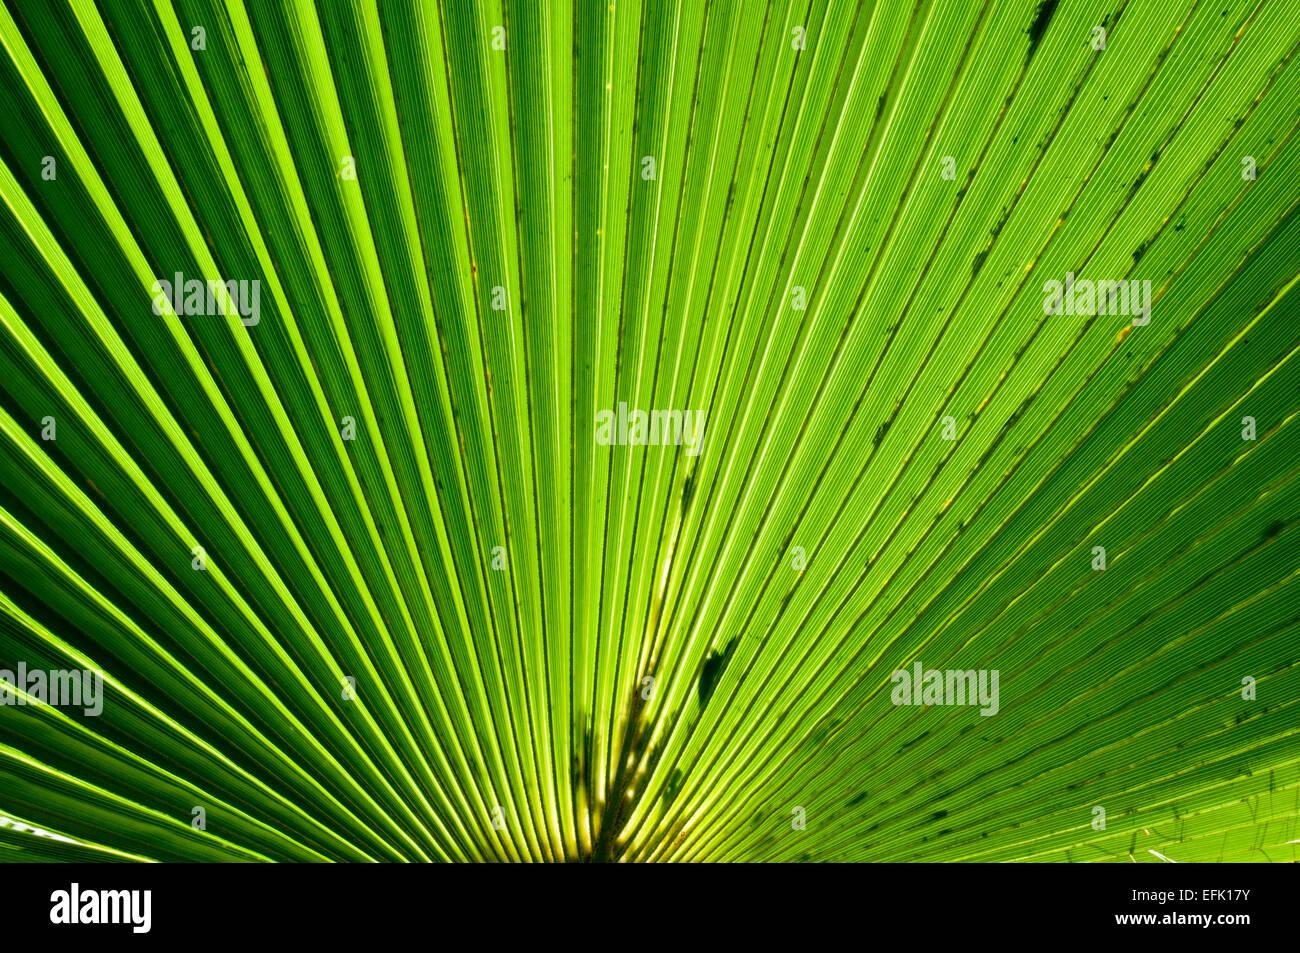 Mexican fan palm (Washingtonia robusta), Baja California Sur near Las Palmas Beach near Todos Santos - Stock Image